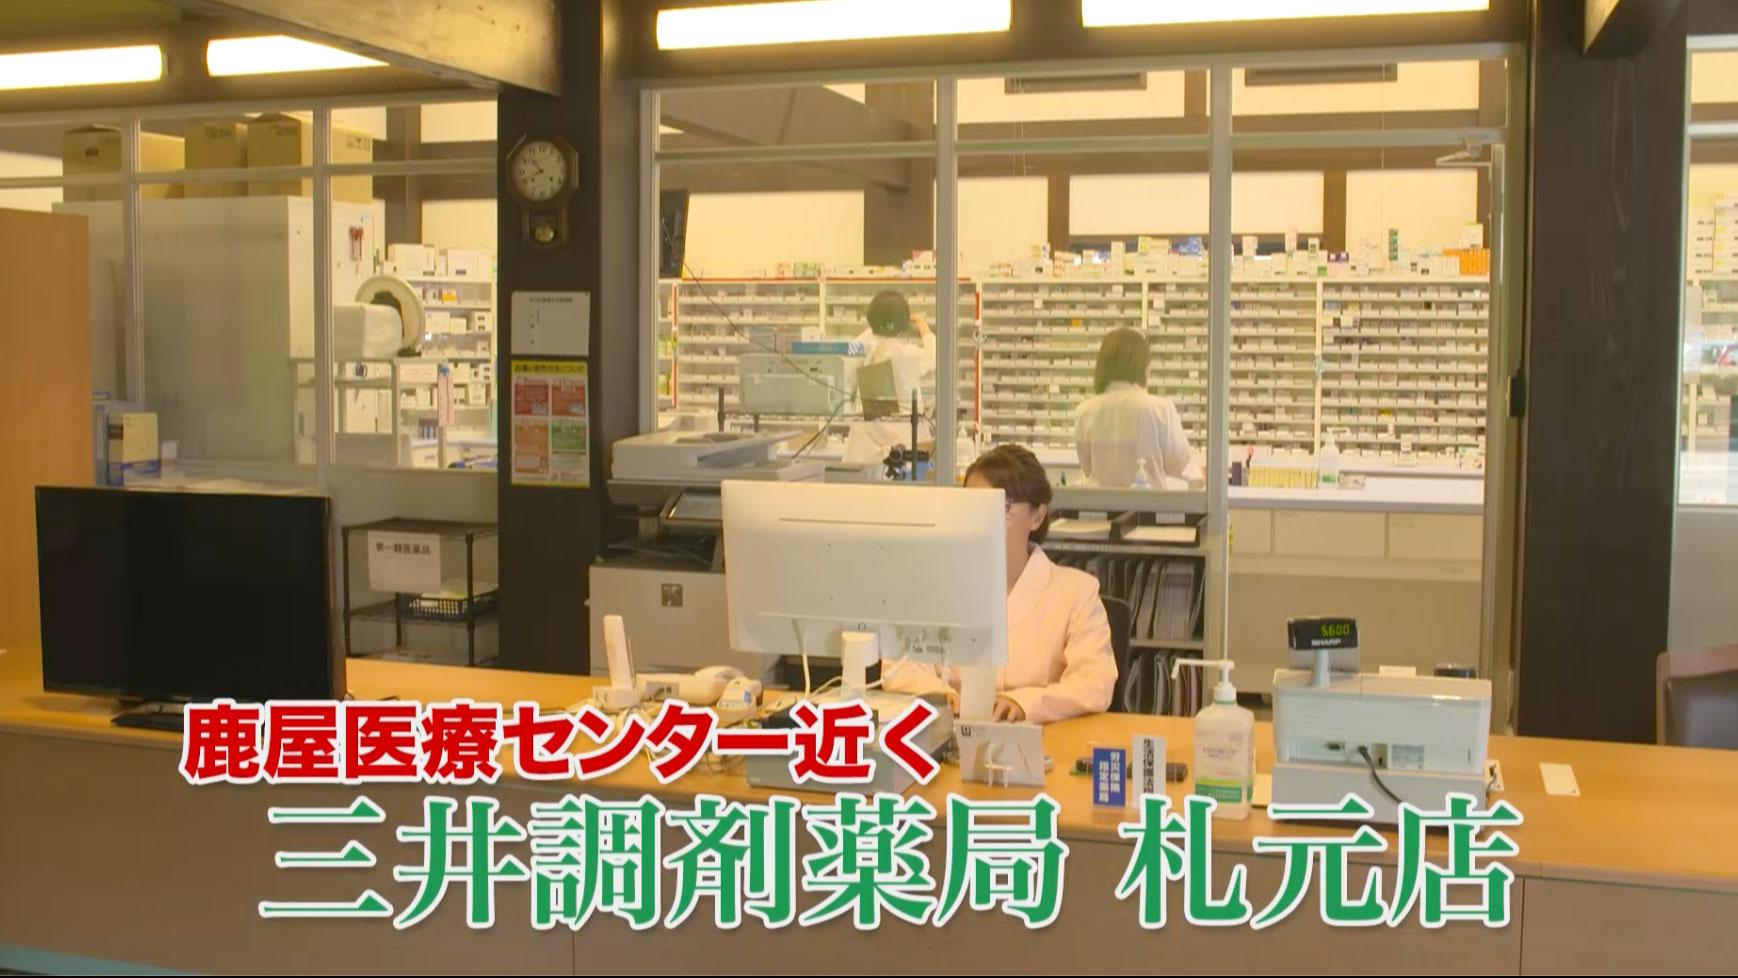 三井調剤薬局TVCMの一場面